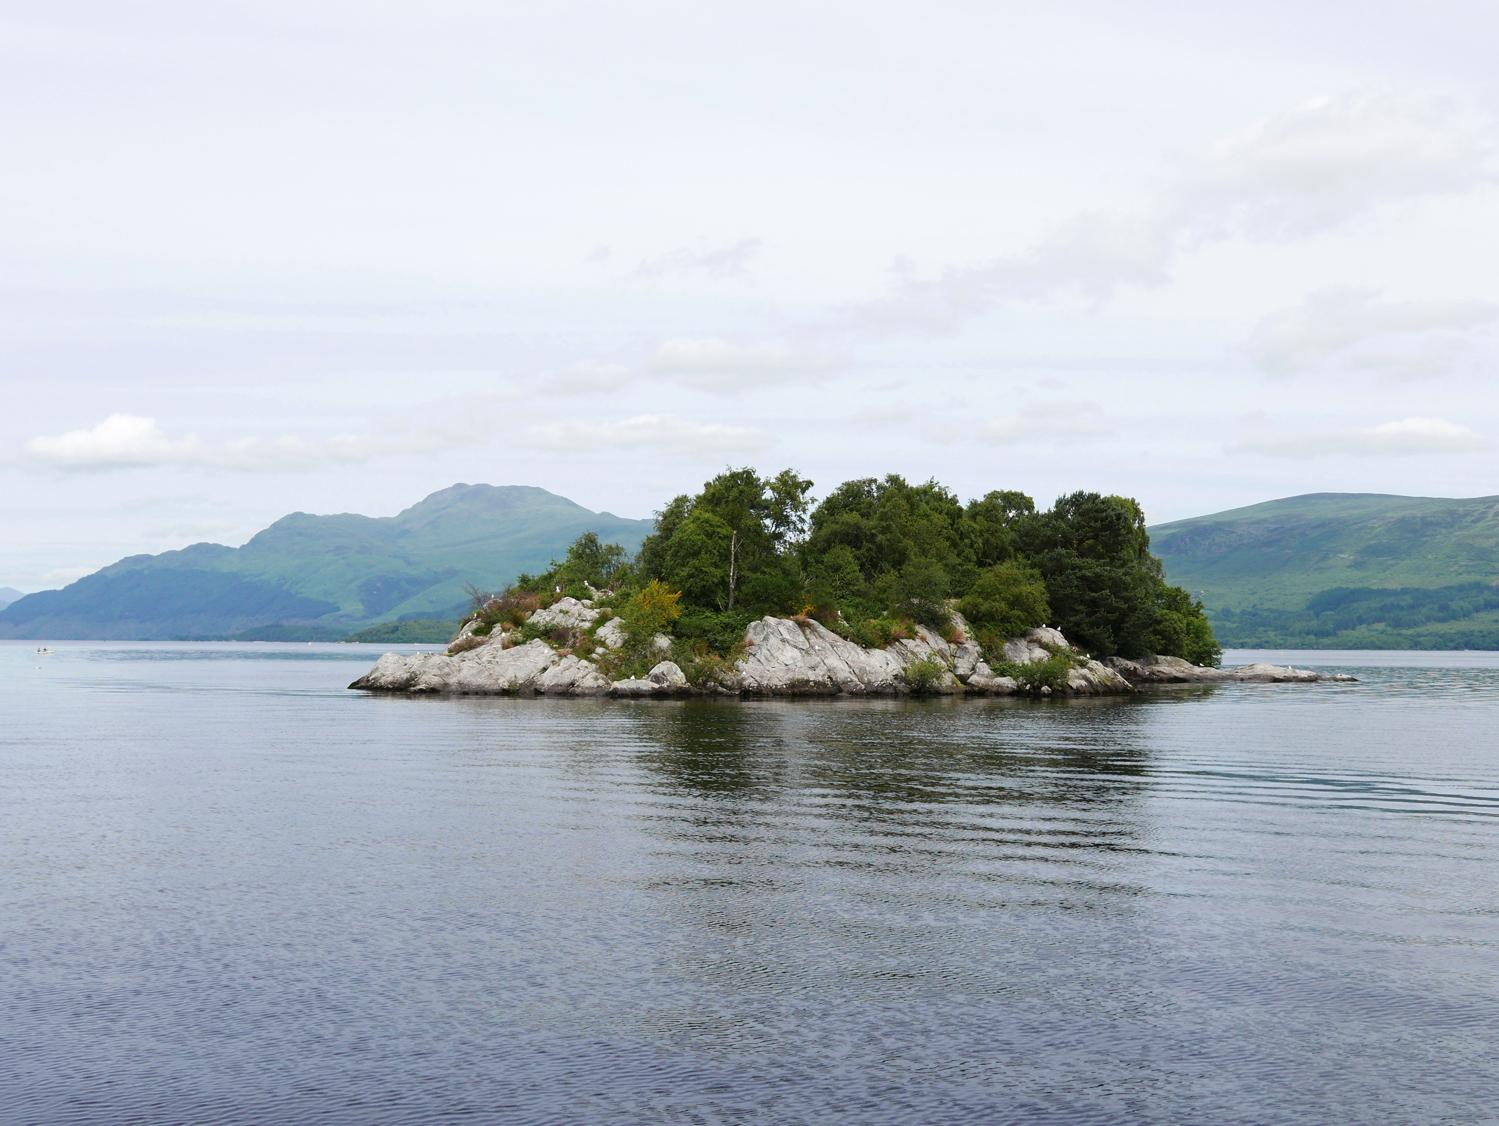 Island portrait